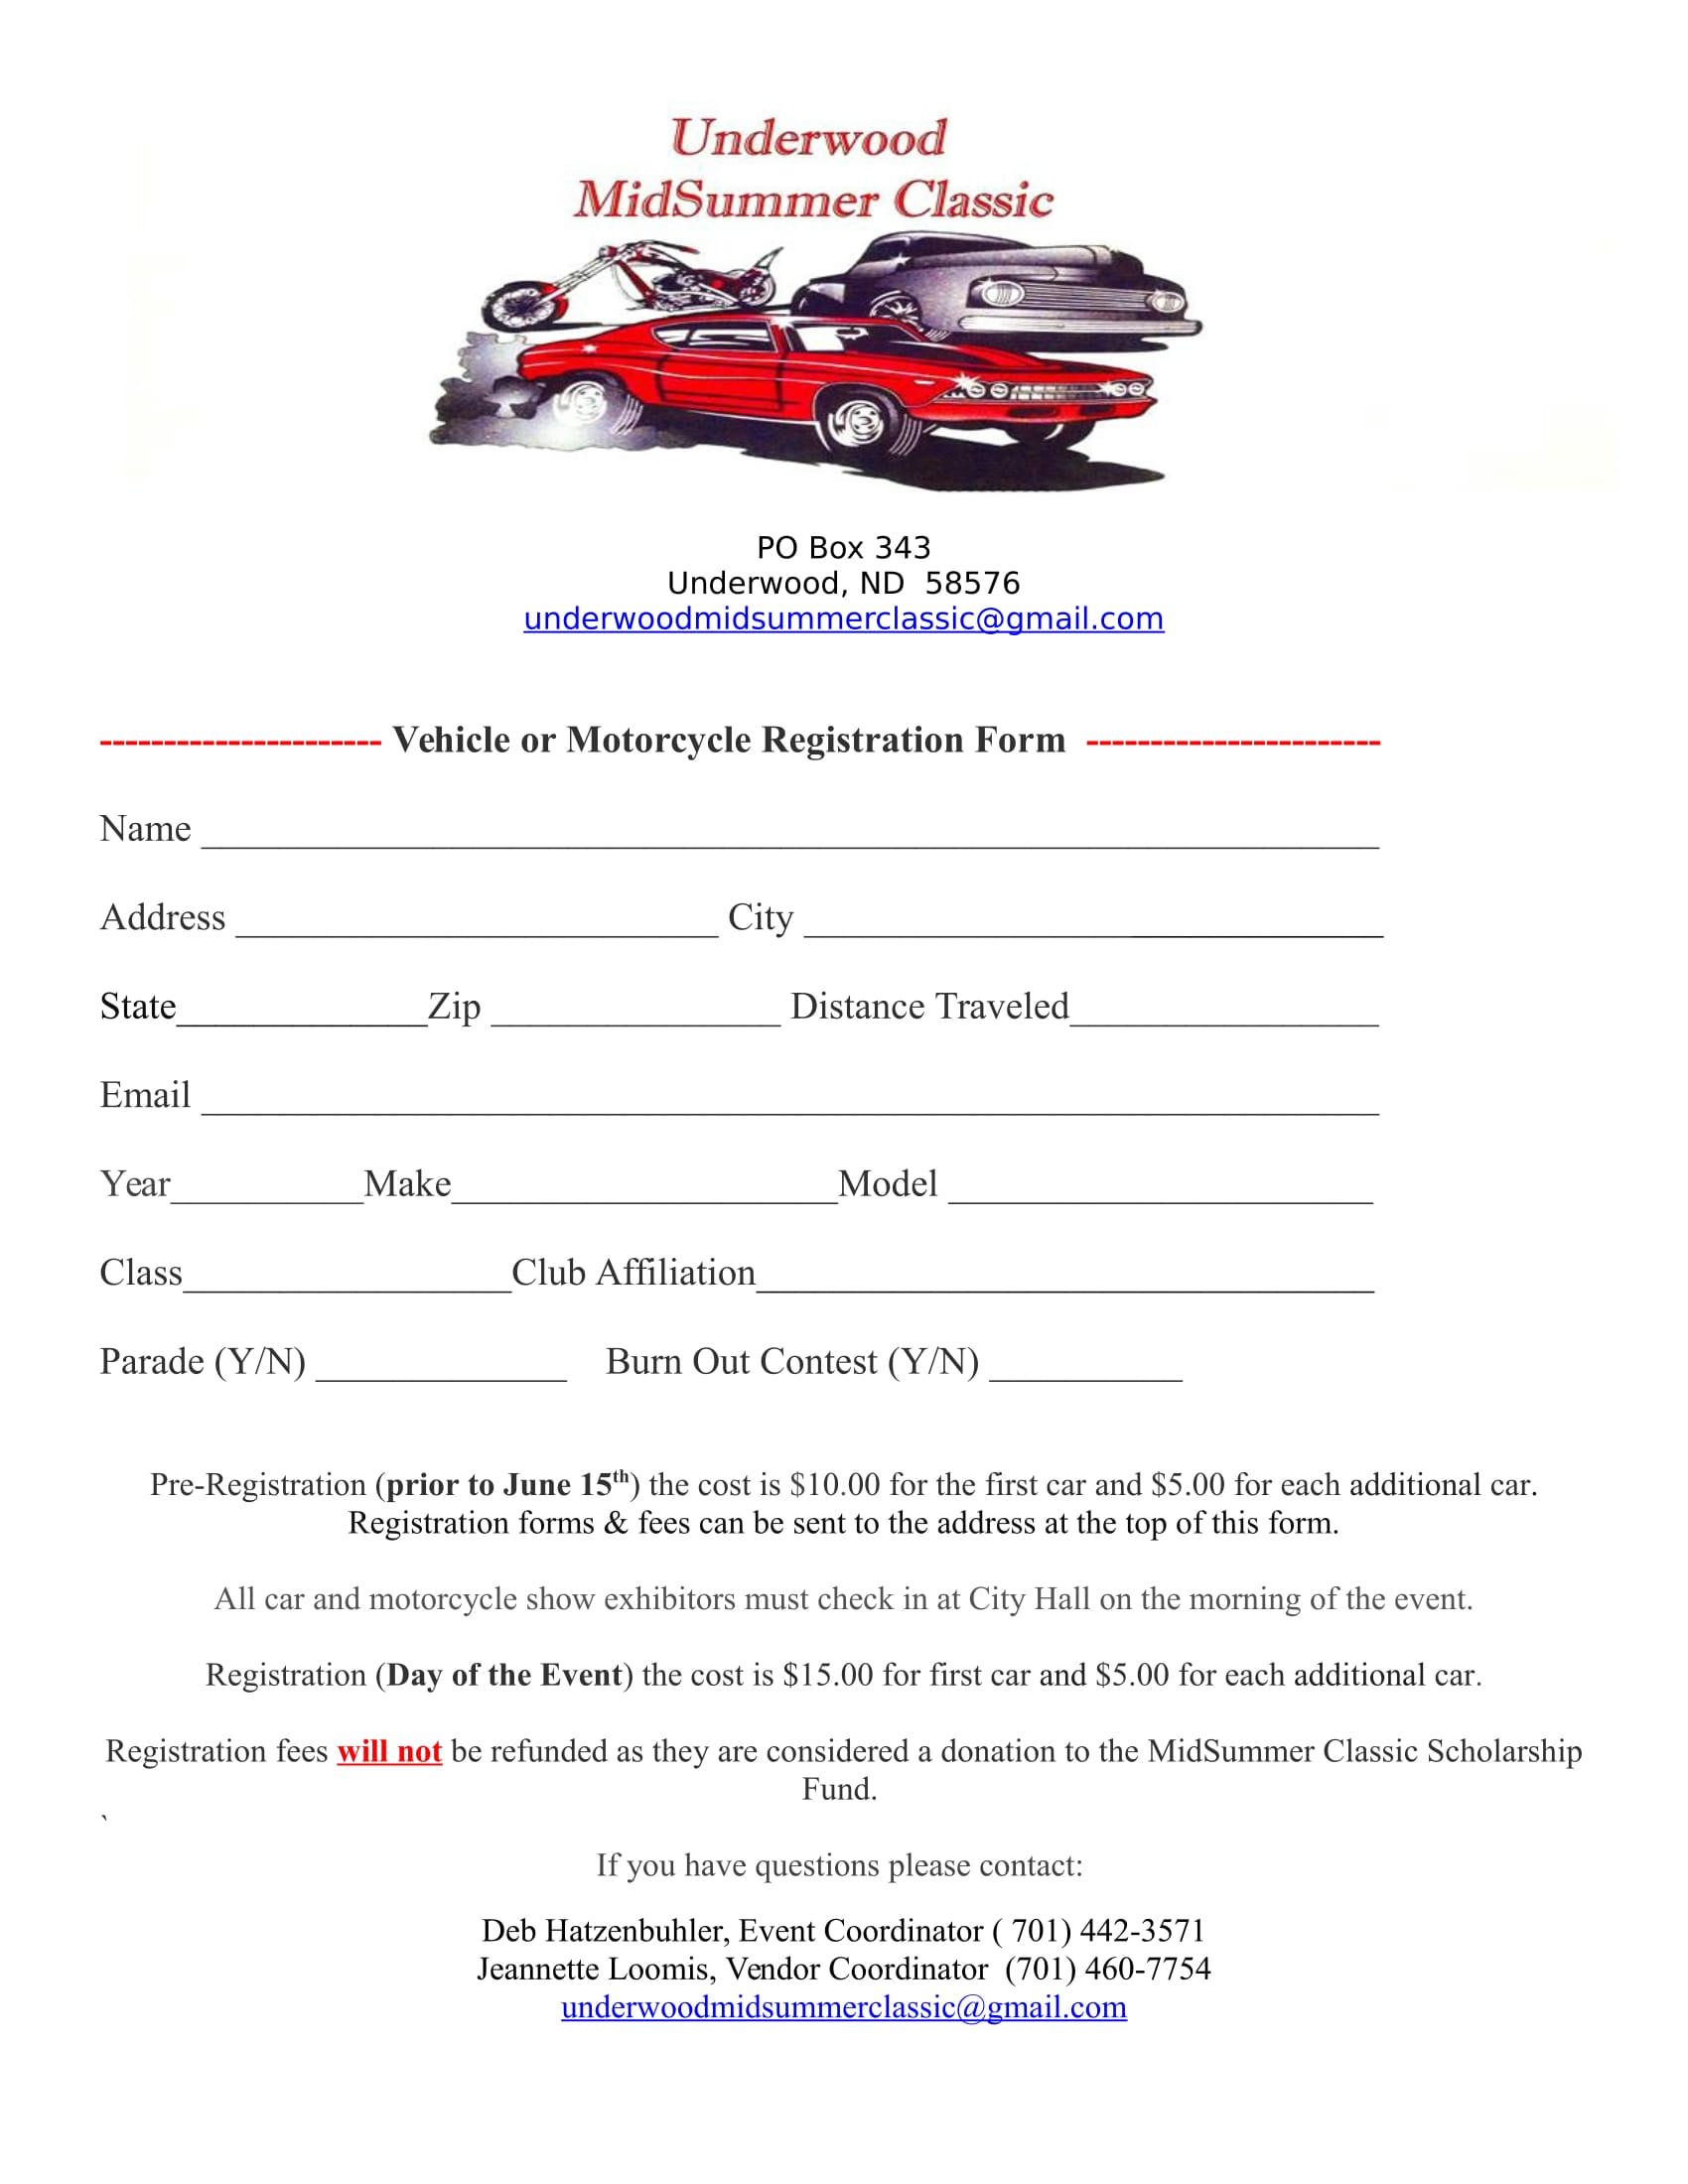 Vehicle Registration Form Template Car Show Radar - Car show registration form template